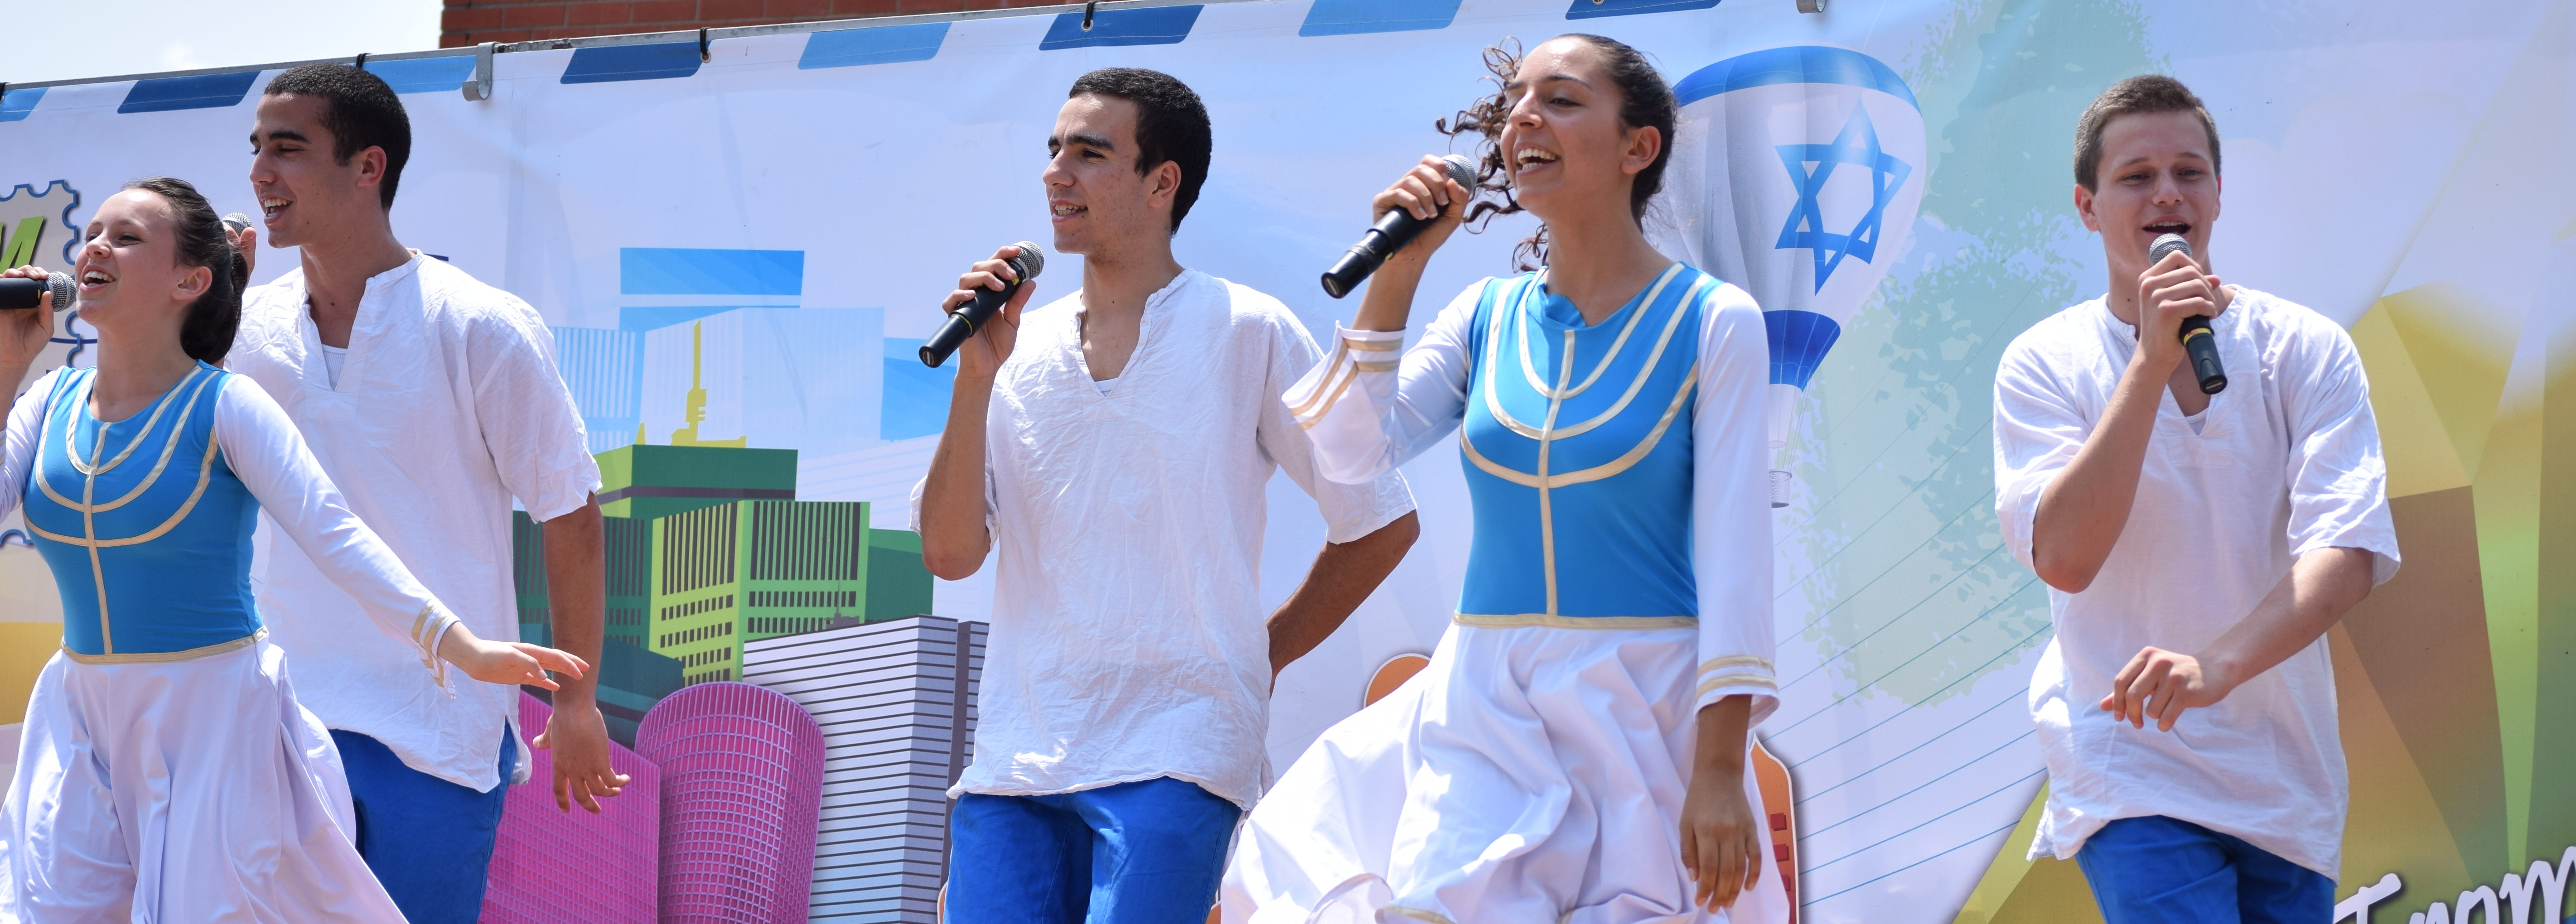 Israeli Performers Provide Free Concert